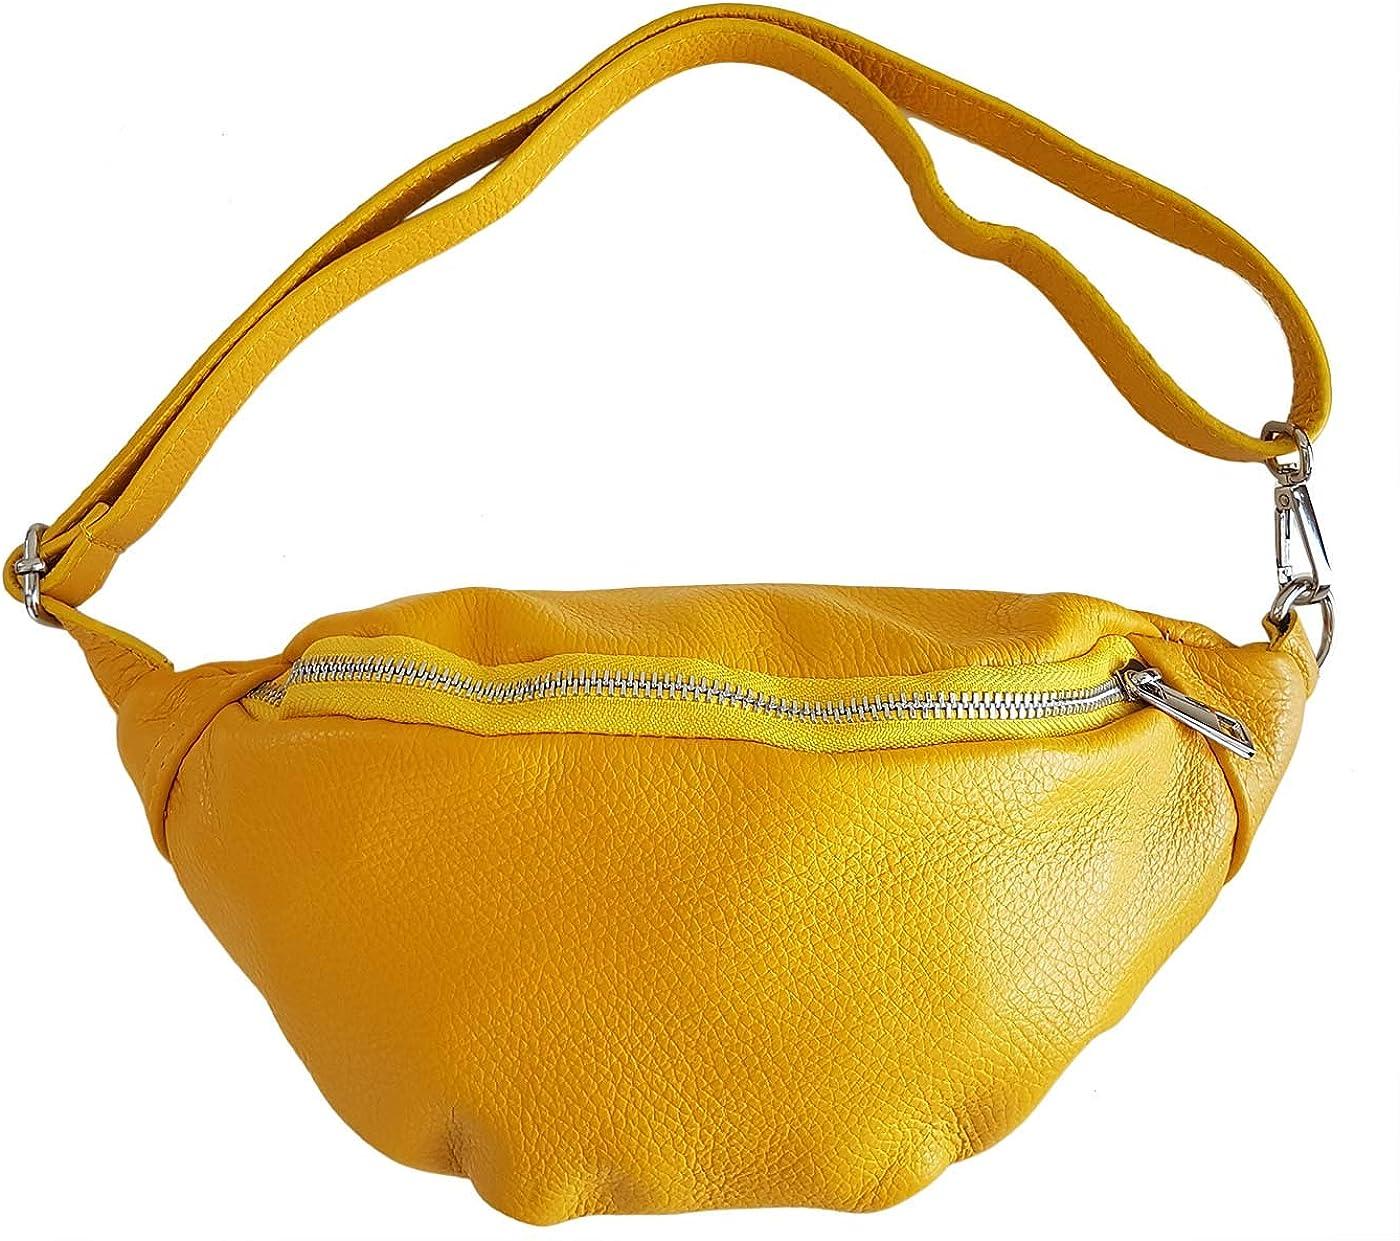 Made in Italy ATELIERS FLORENTINS Sac banane port/é ceinture en cuir pour femme